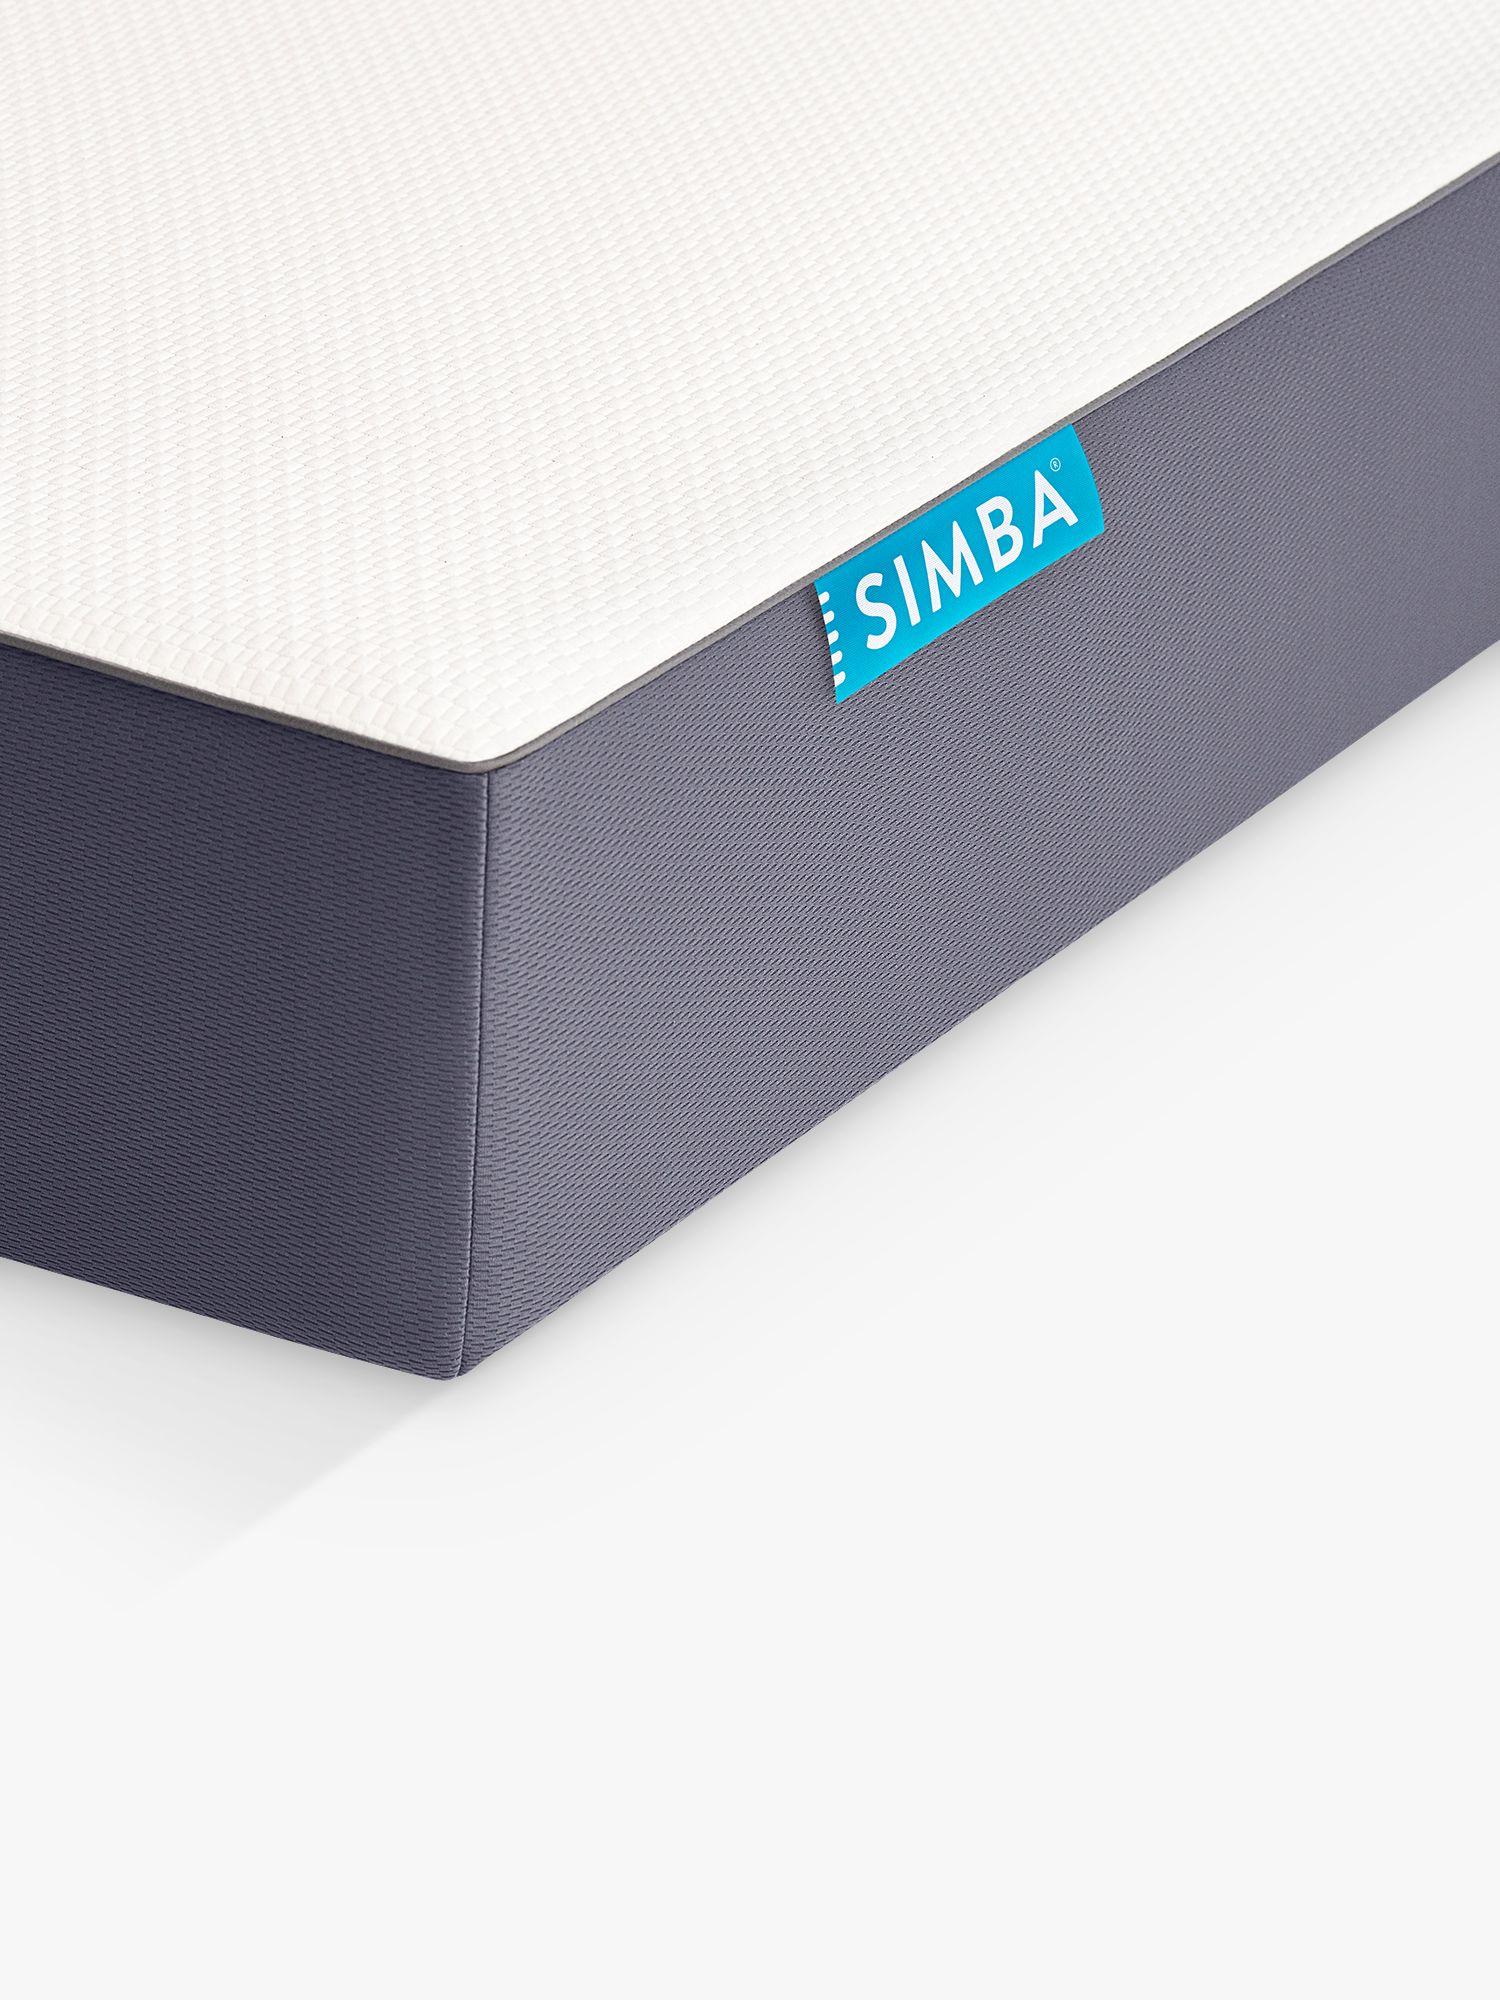 Simba SIMBA Hybrid Memory Foam Pocket Spring Mattress, Super King Size